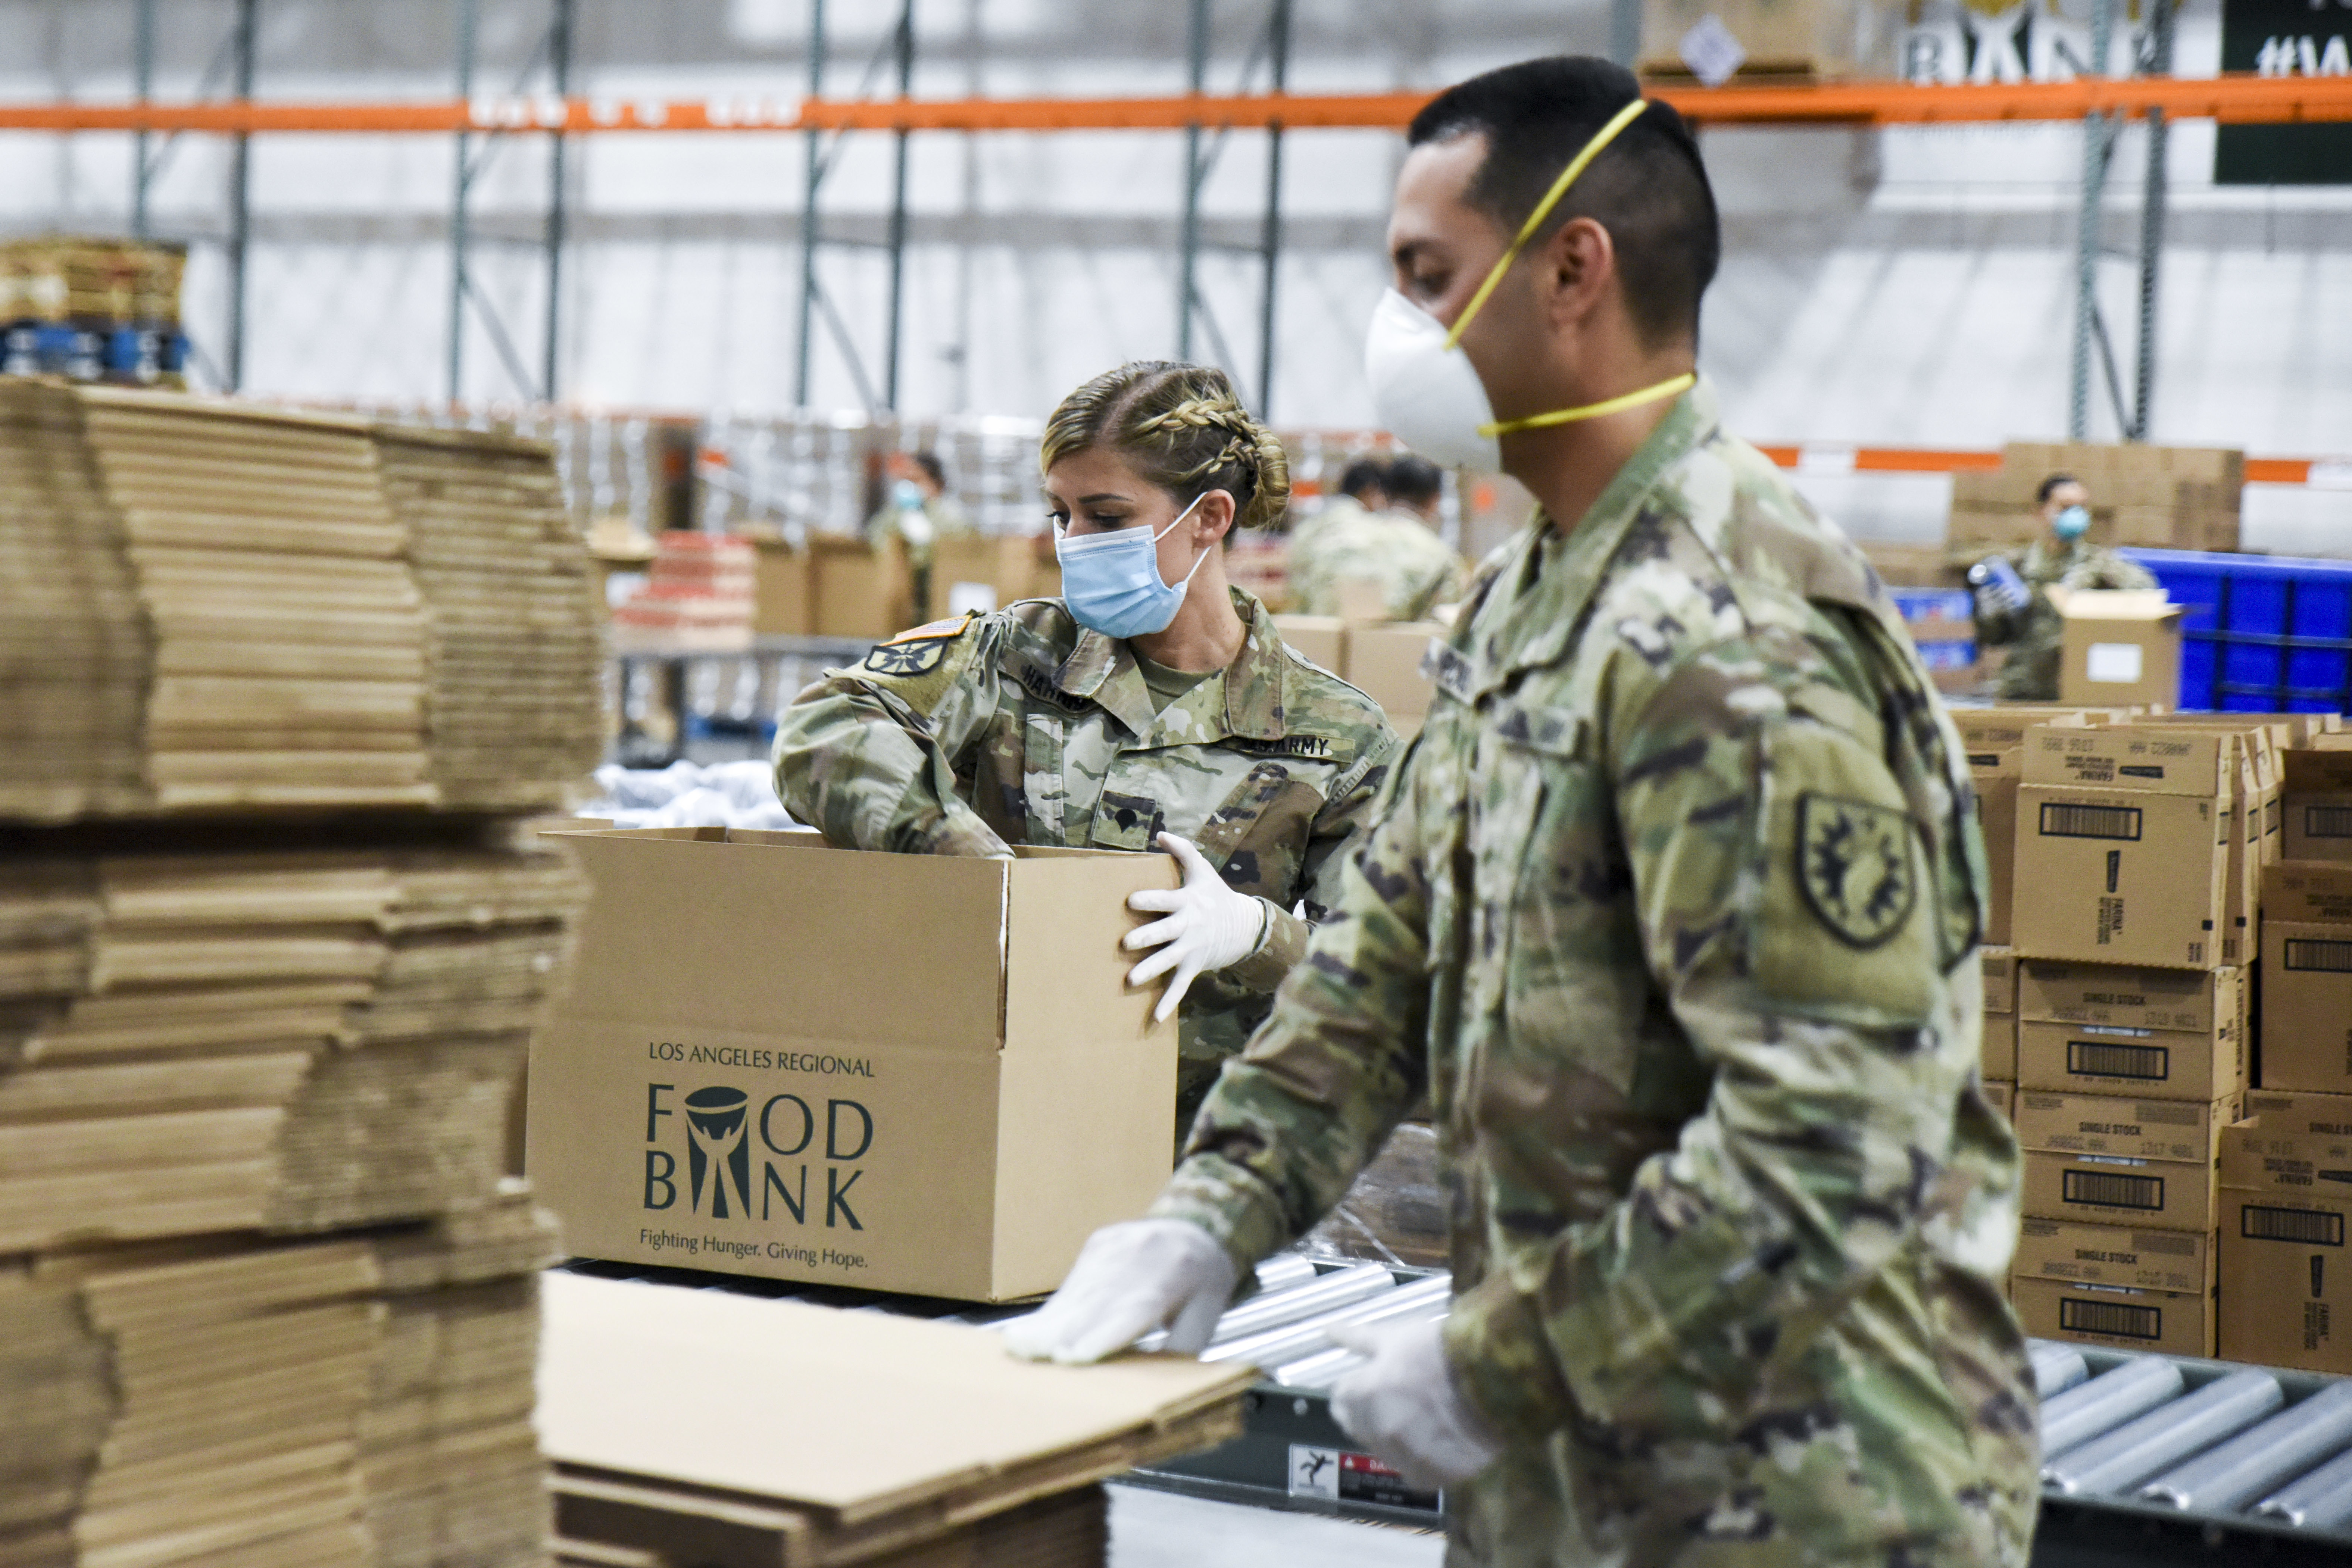 Caption: Members of the California Army National Guard assemble emergency food kits at the Los Angeles Regional Food Bank. , Credit: Jason Sanchez / U.S. Air National Guard